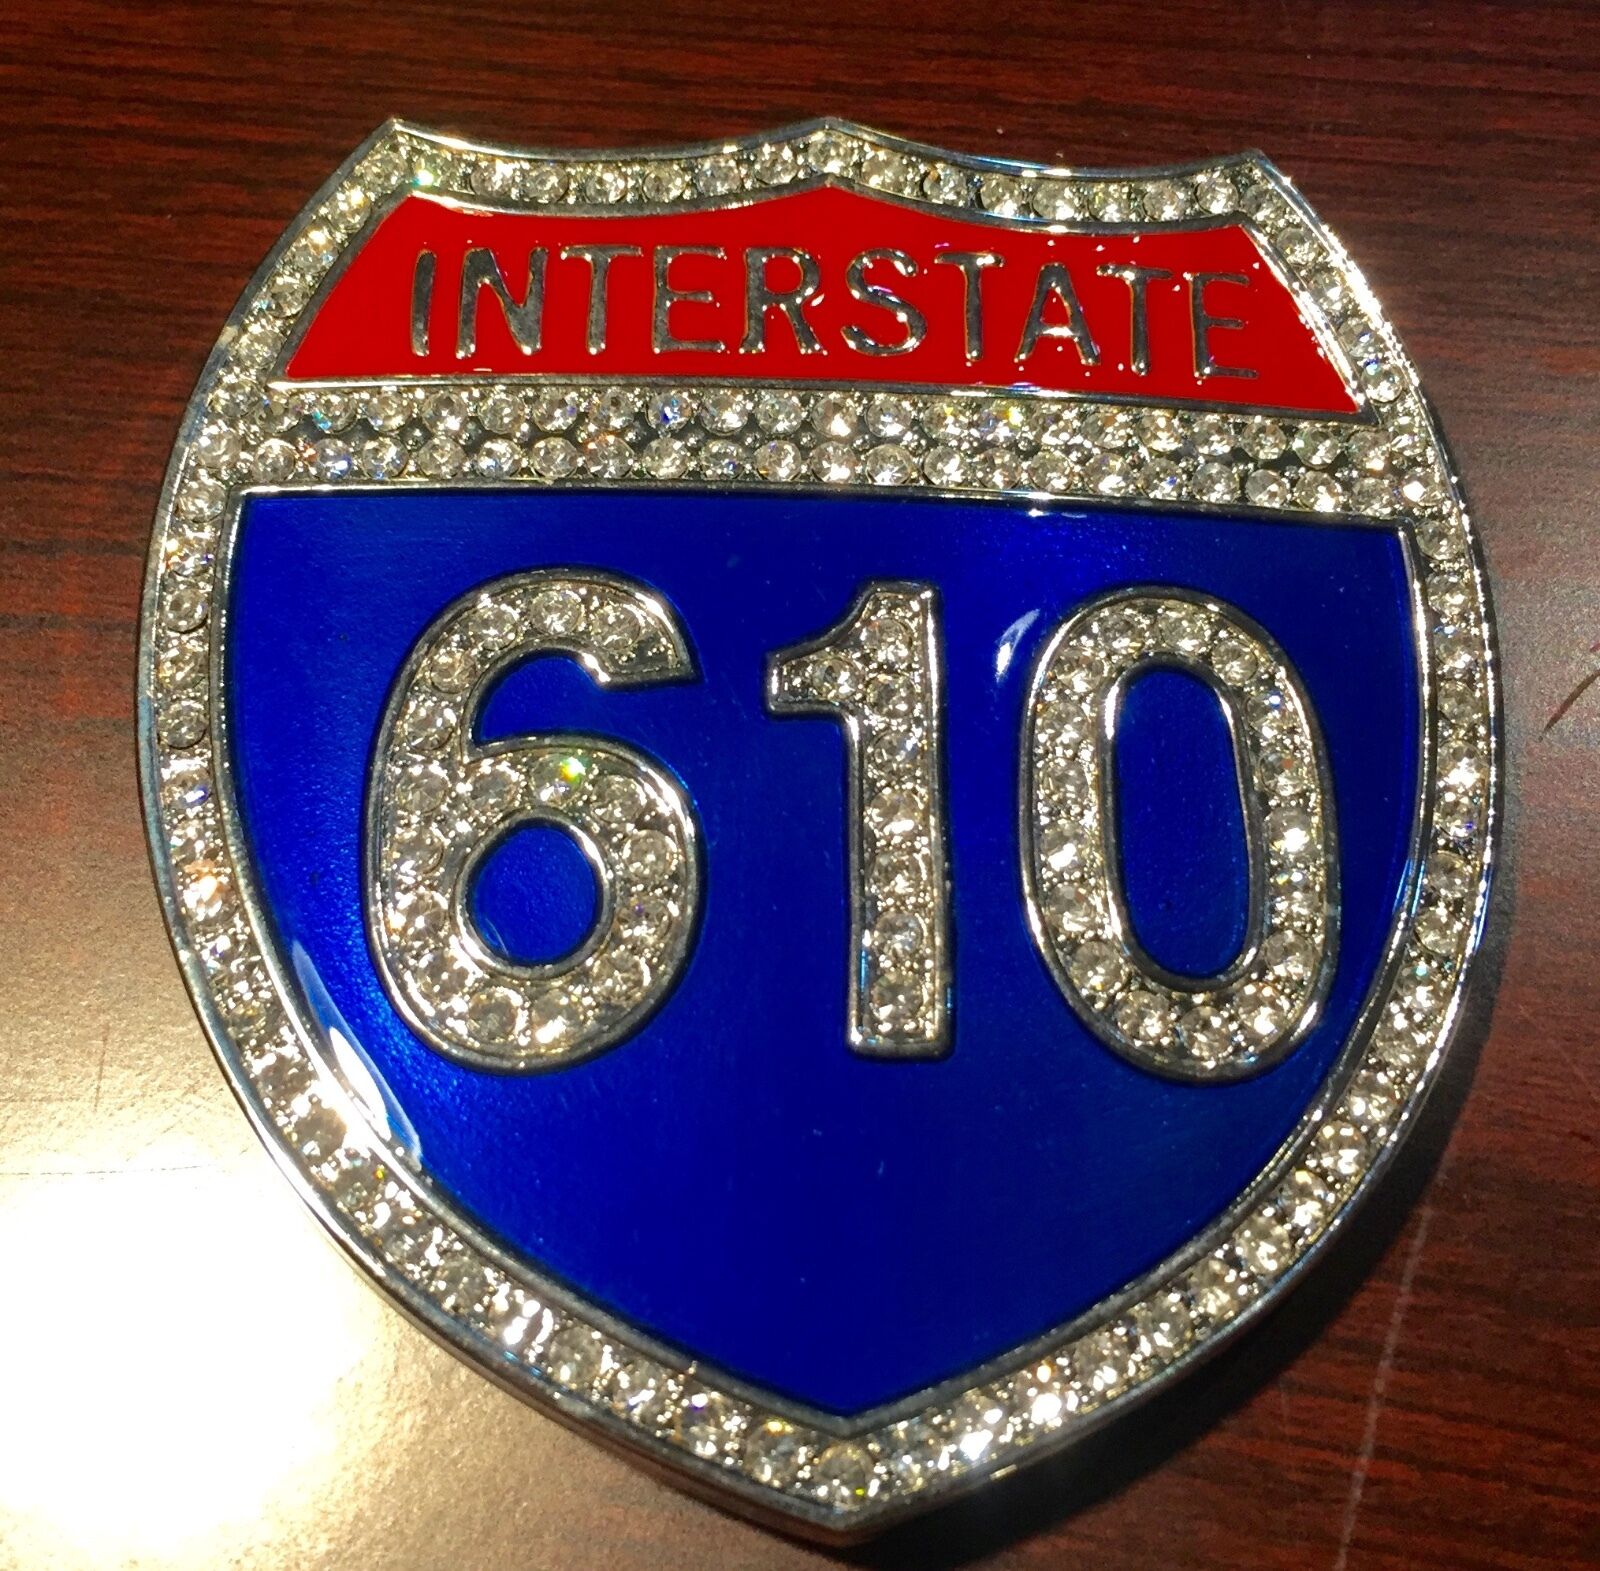 BEAUTIFUL BIKERS BELT BUCKLE INTERSTATE 610 RHINESTONE STEEL NEW GREAT GIFT